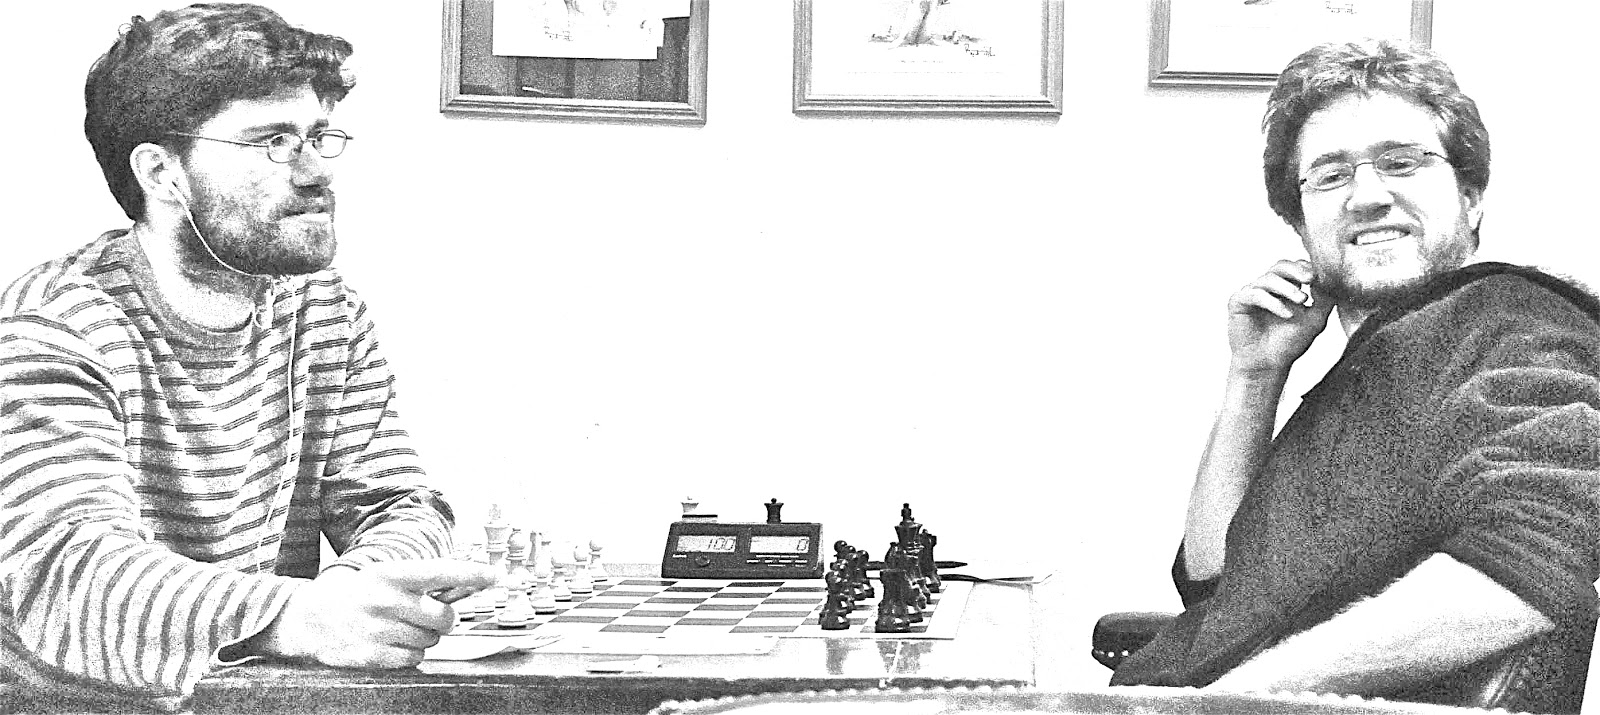 Boylston Chess Club Weblog: January 2013